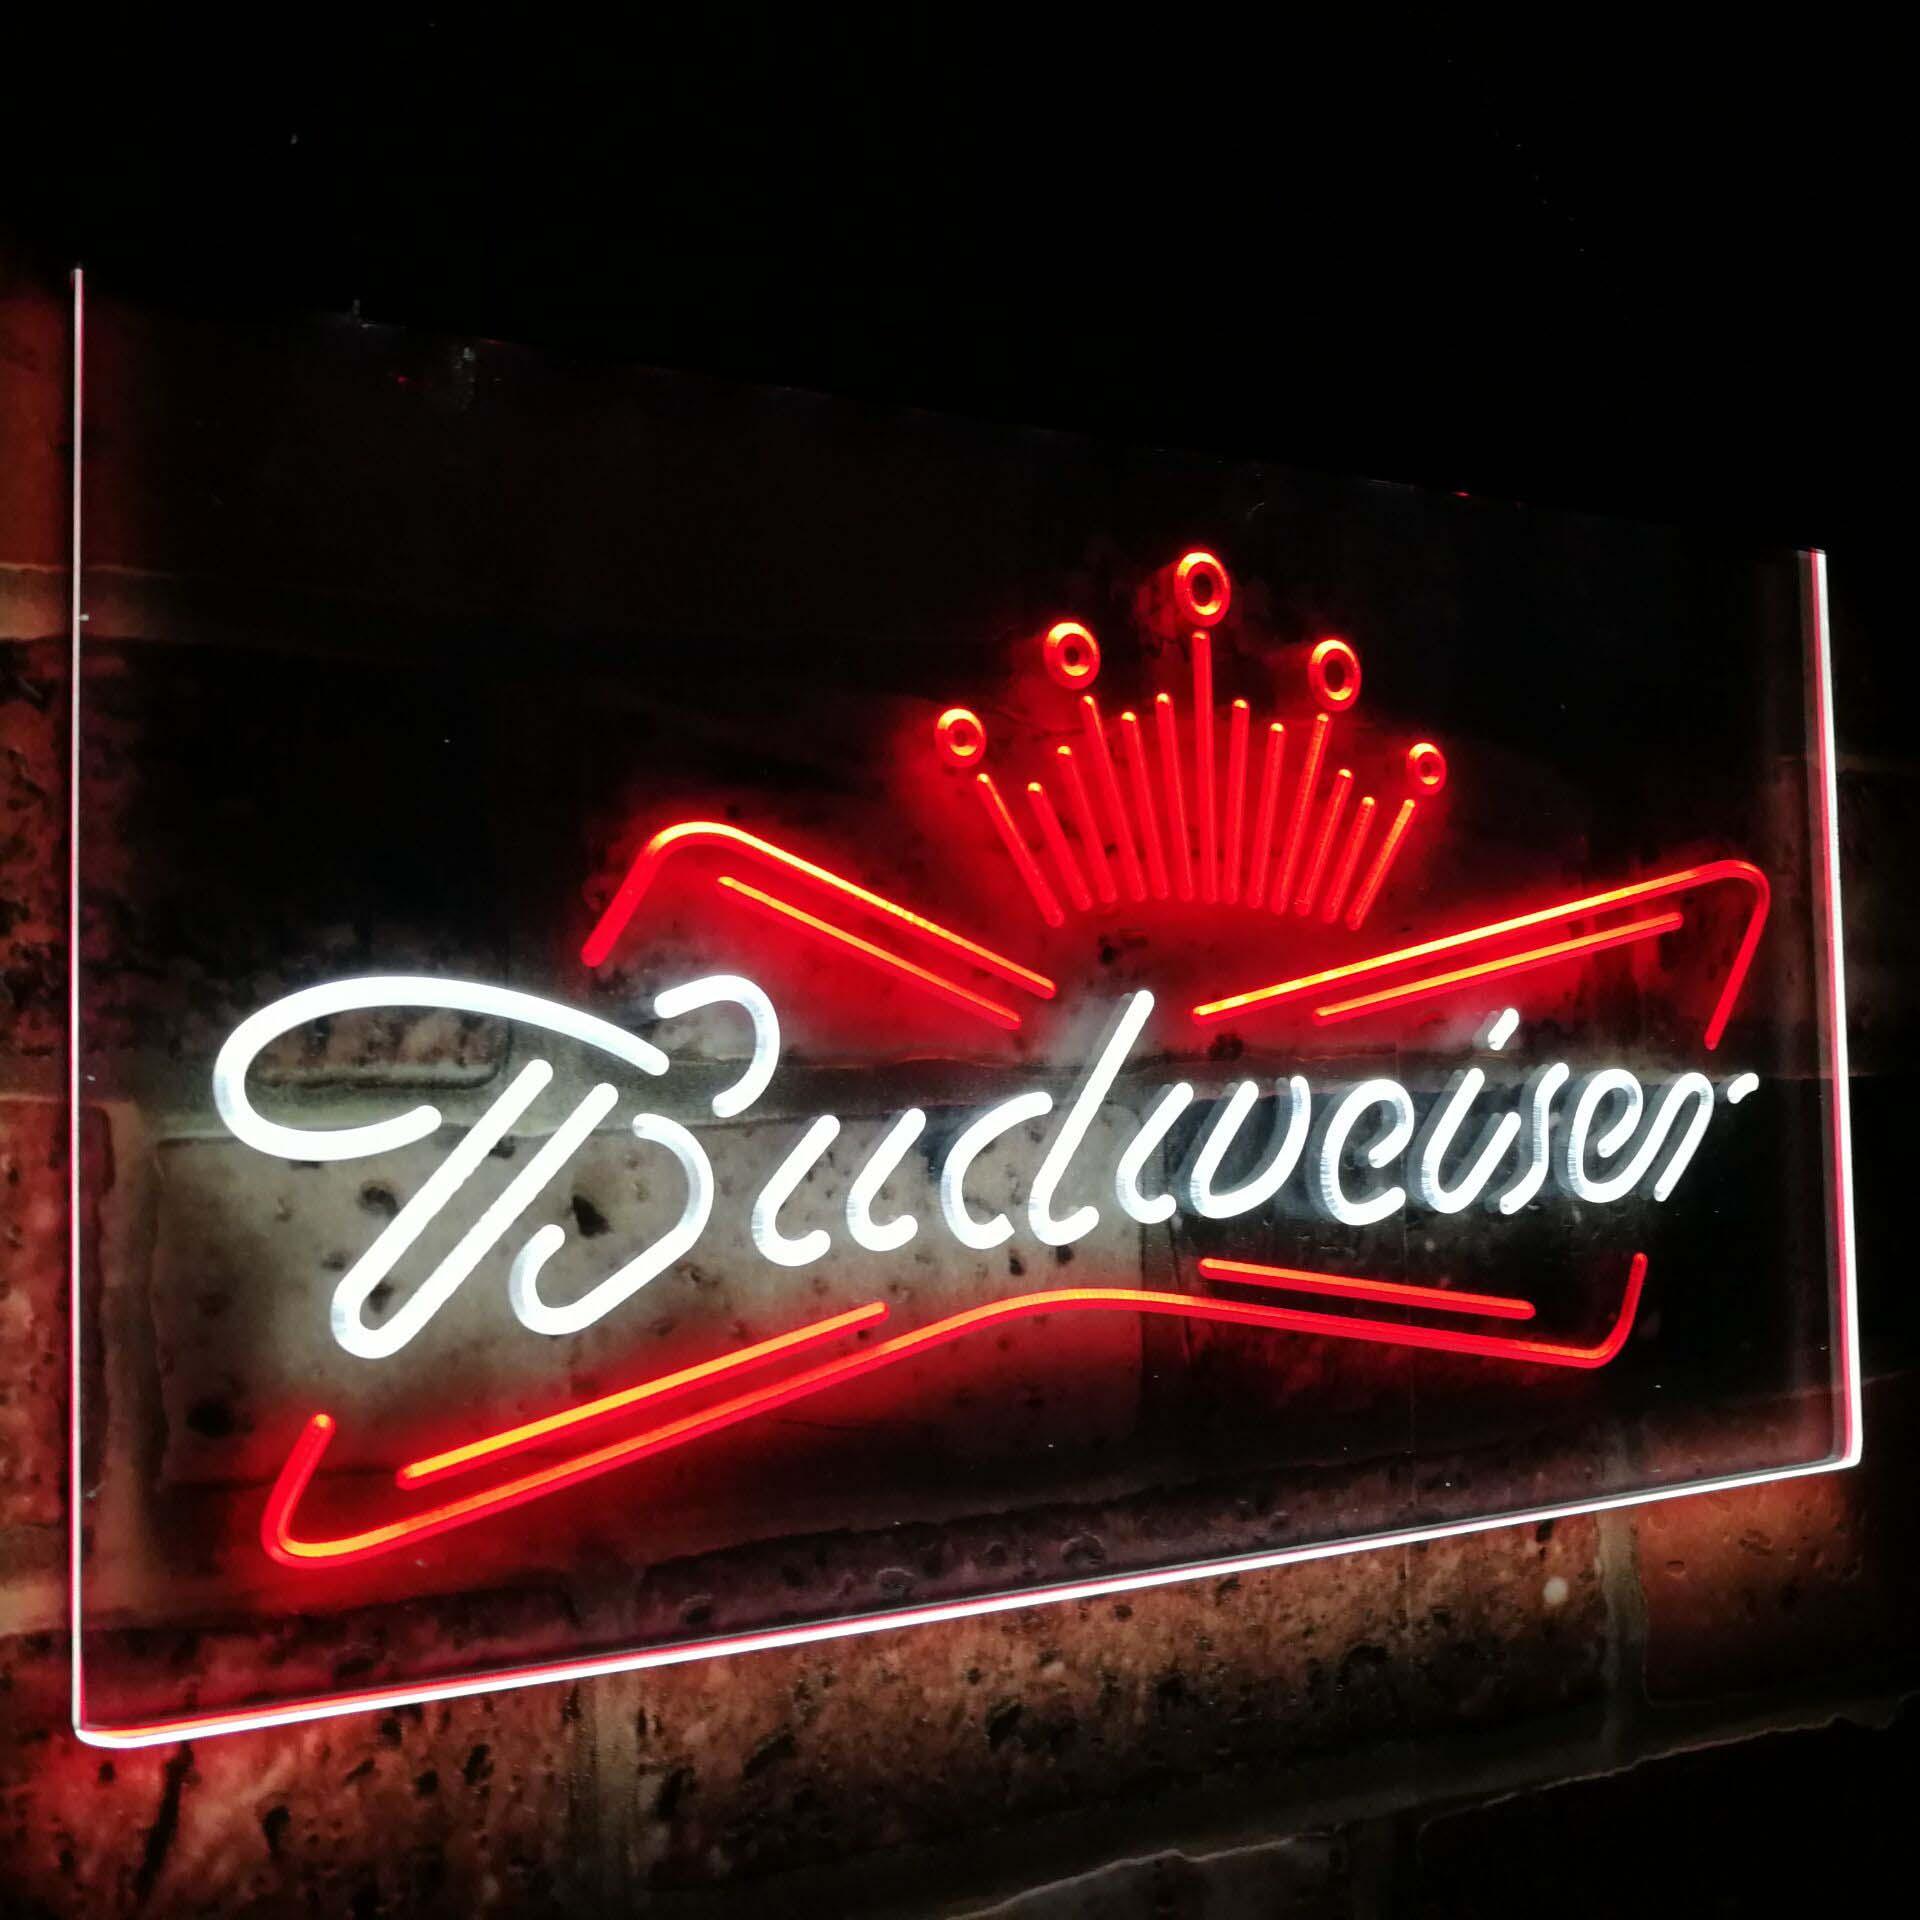 Budweiser King Beer Bar Decoration Gift Dual Color Led Neon Sign st6-a2005Budweiser King Beer Bar Decoration Gift Dual Color Led Neon Sign st6-a2005